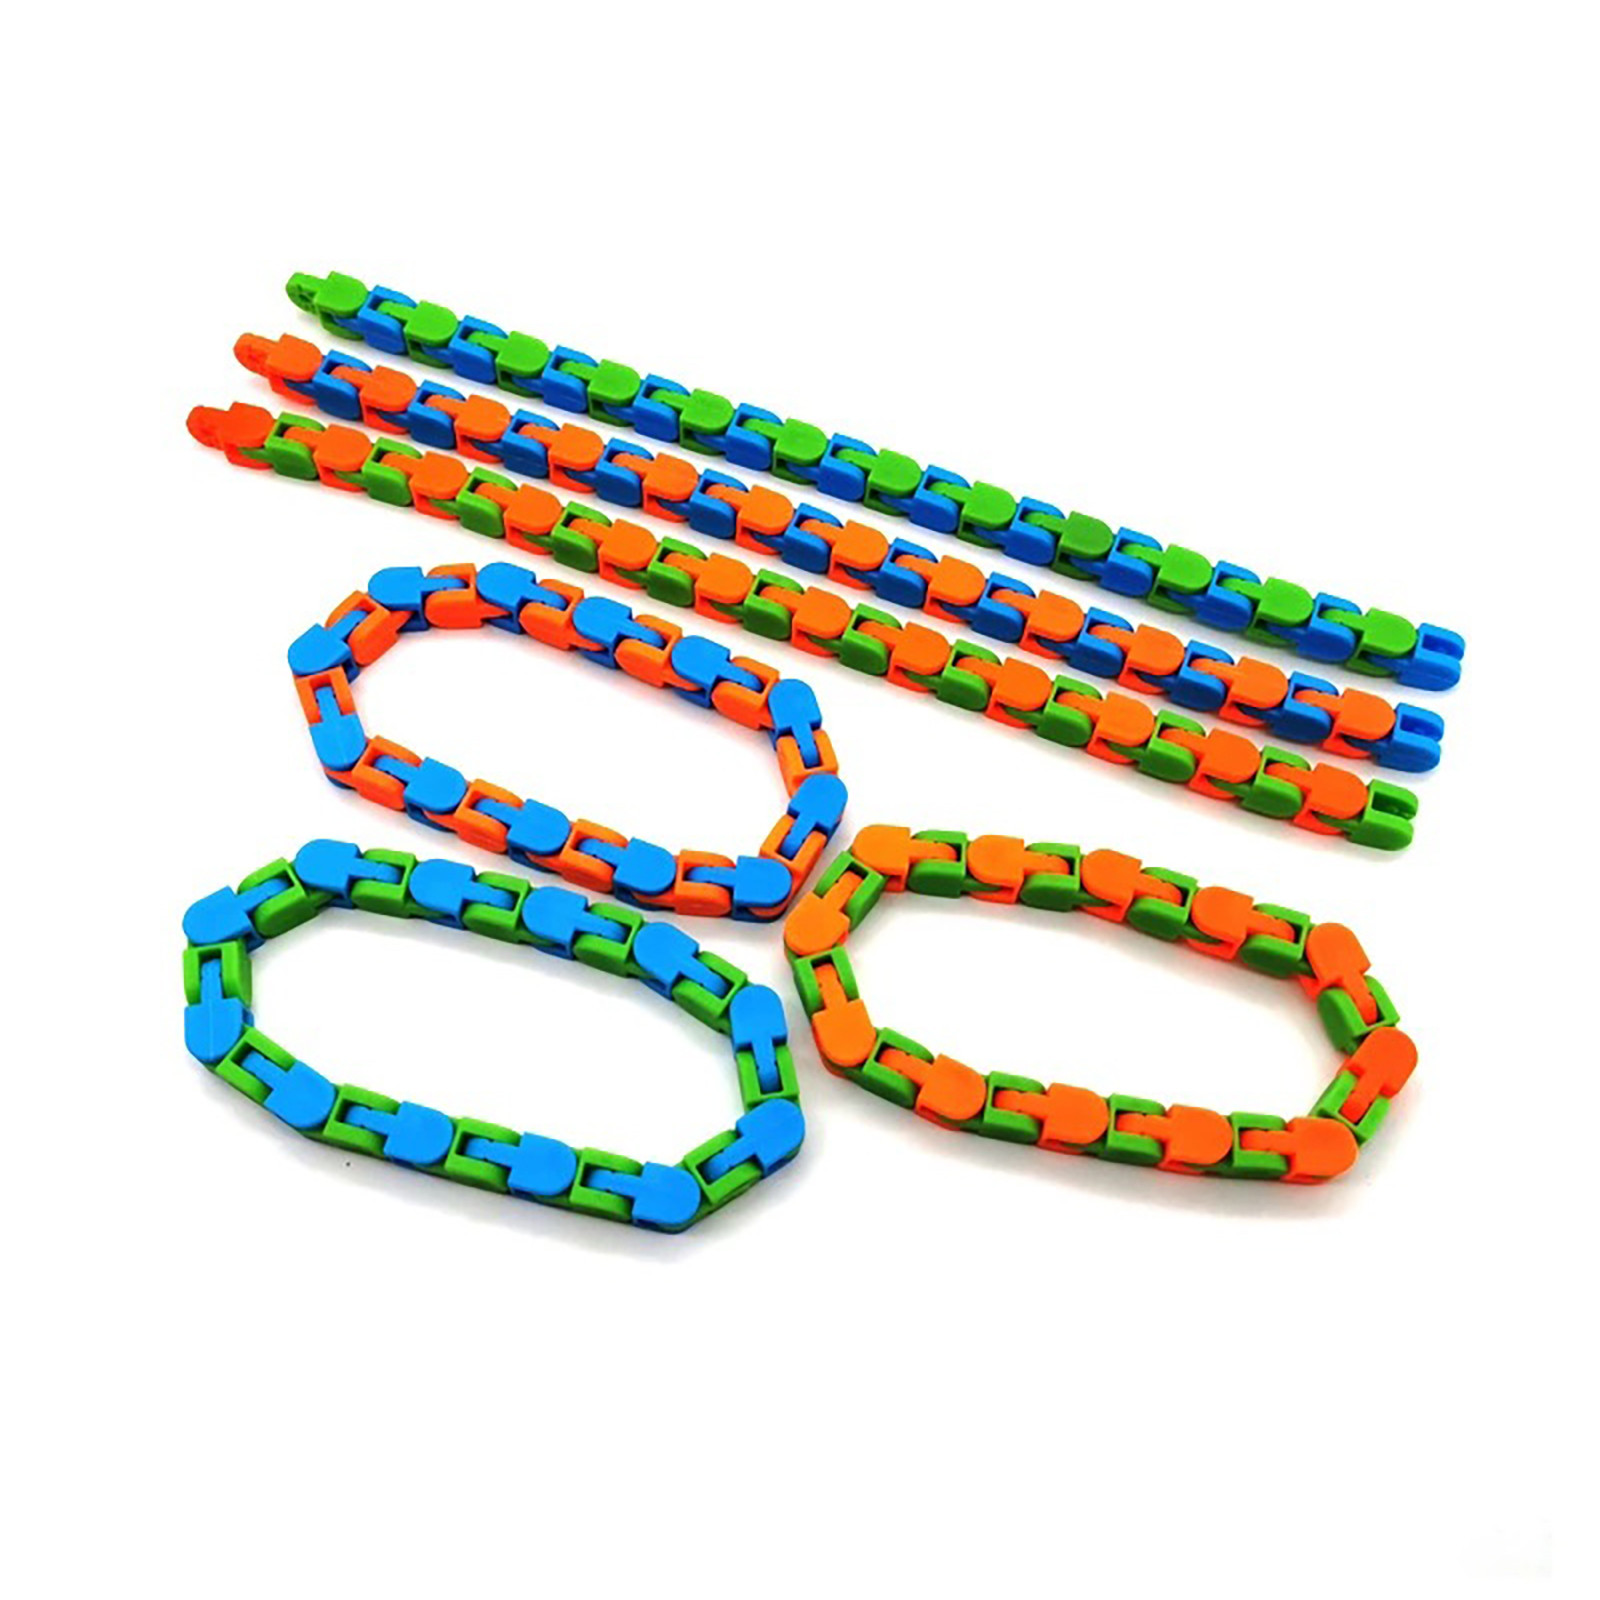 Fidget-Toys Stress Tangle Relief-Rotate Sensory Colorful Shape 24-Bit Puzzle Zabawki img3